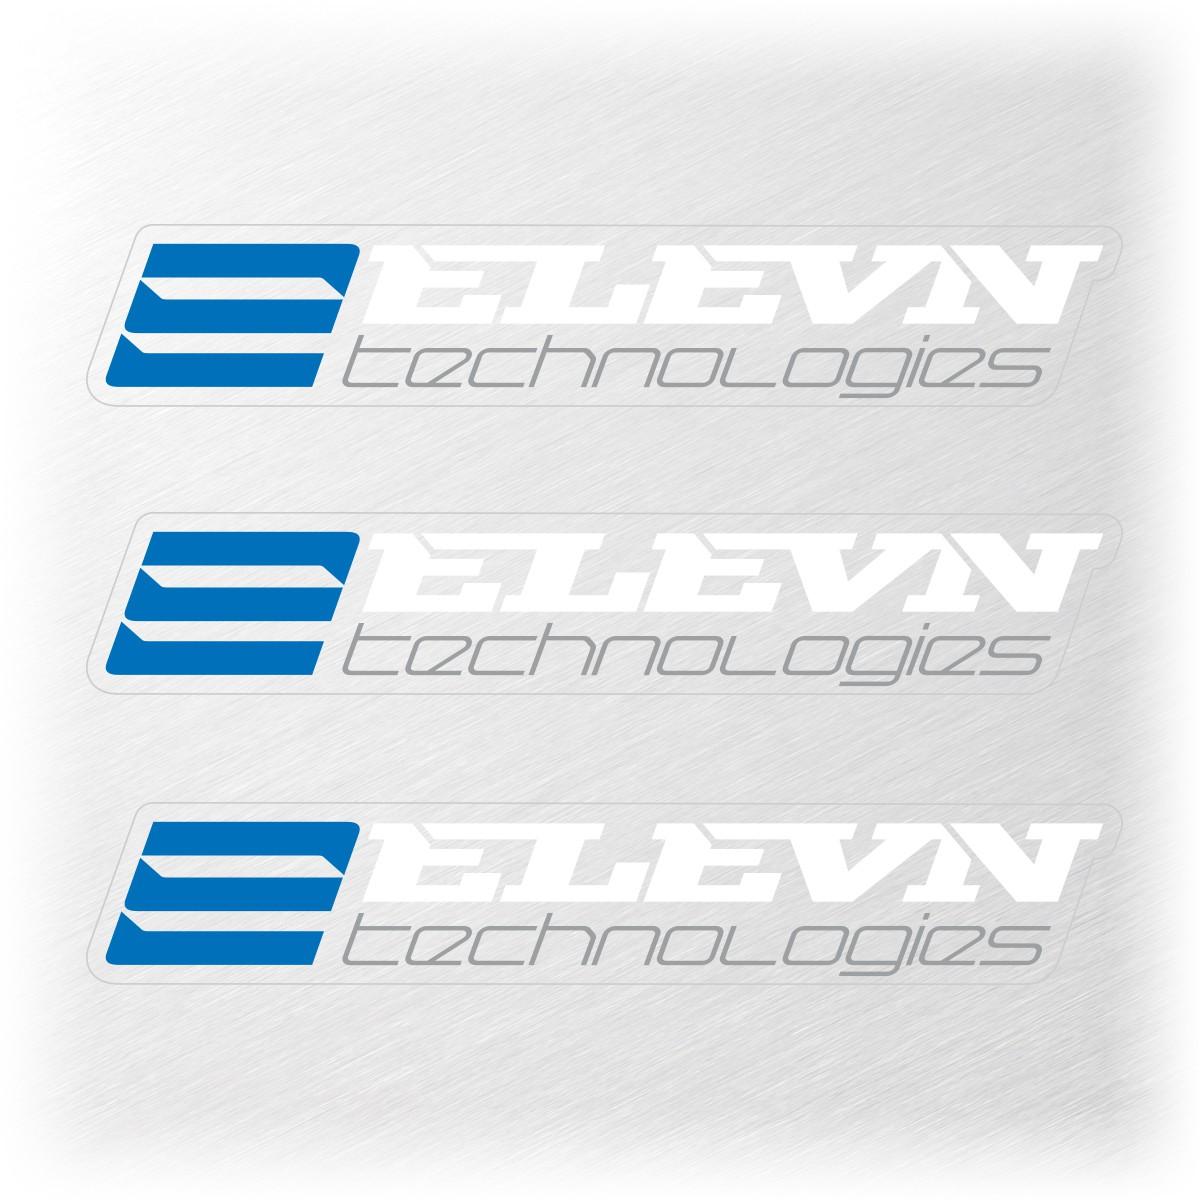 ELEVN SMALL STICKER 111x19MM PACK X 3 WHITE/BLUE